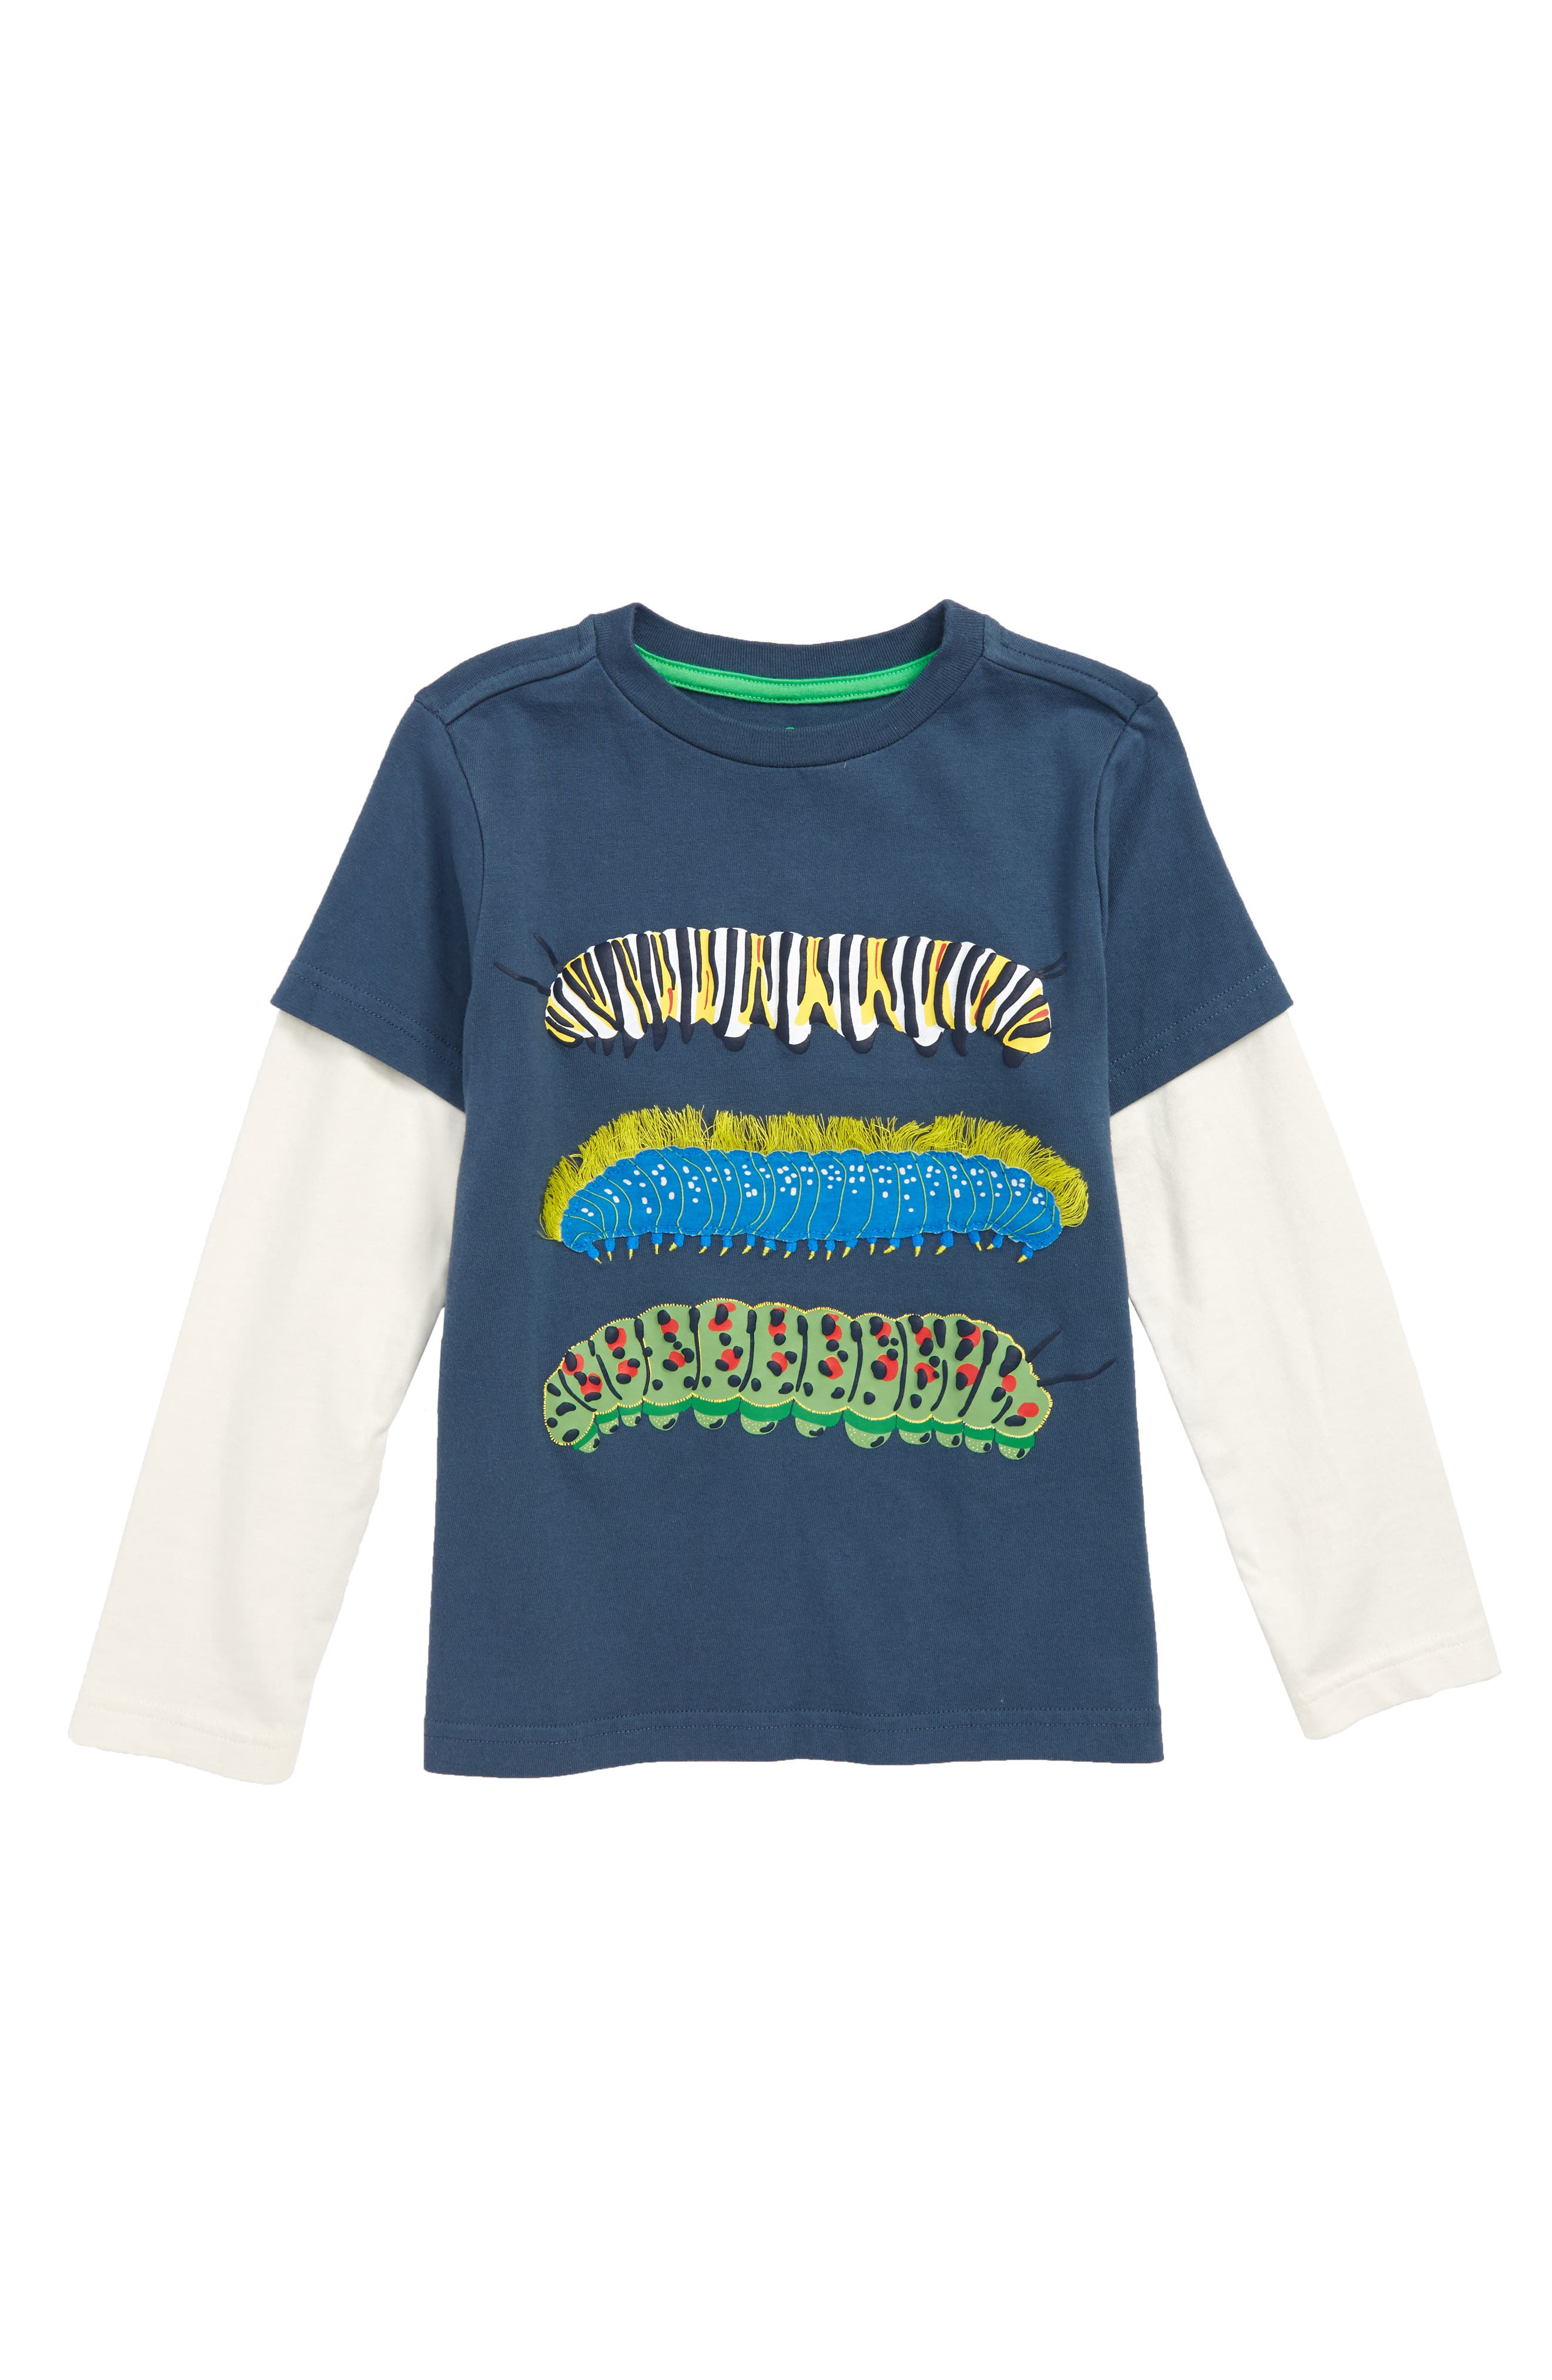 MINI BODEN,                             Creepy Crawly Caterpillars Layered T-Shirt,                             Main thumbnail 1, color,                             400